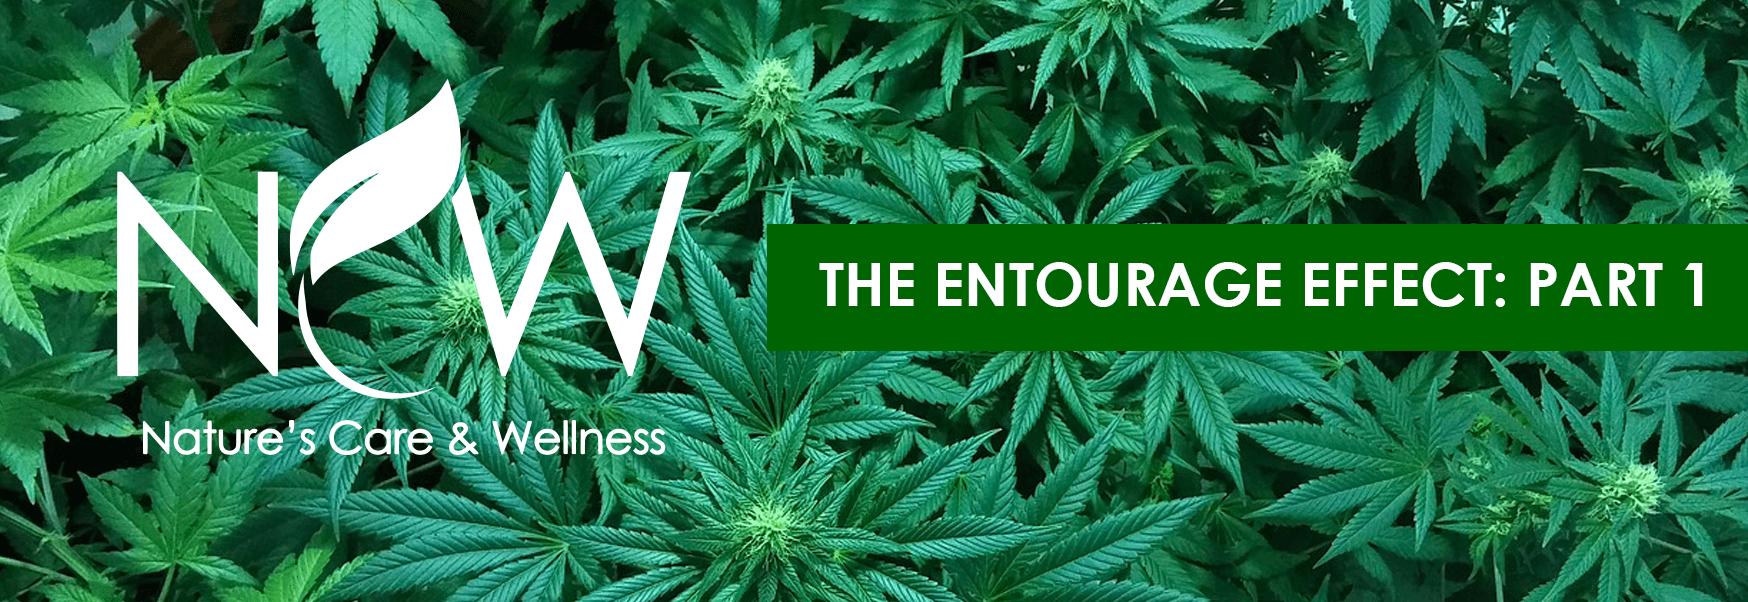 The Entourage Effect: Part 1